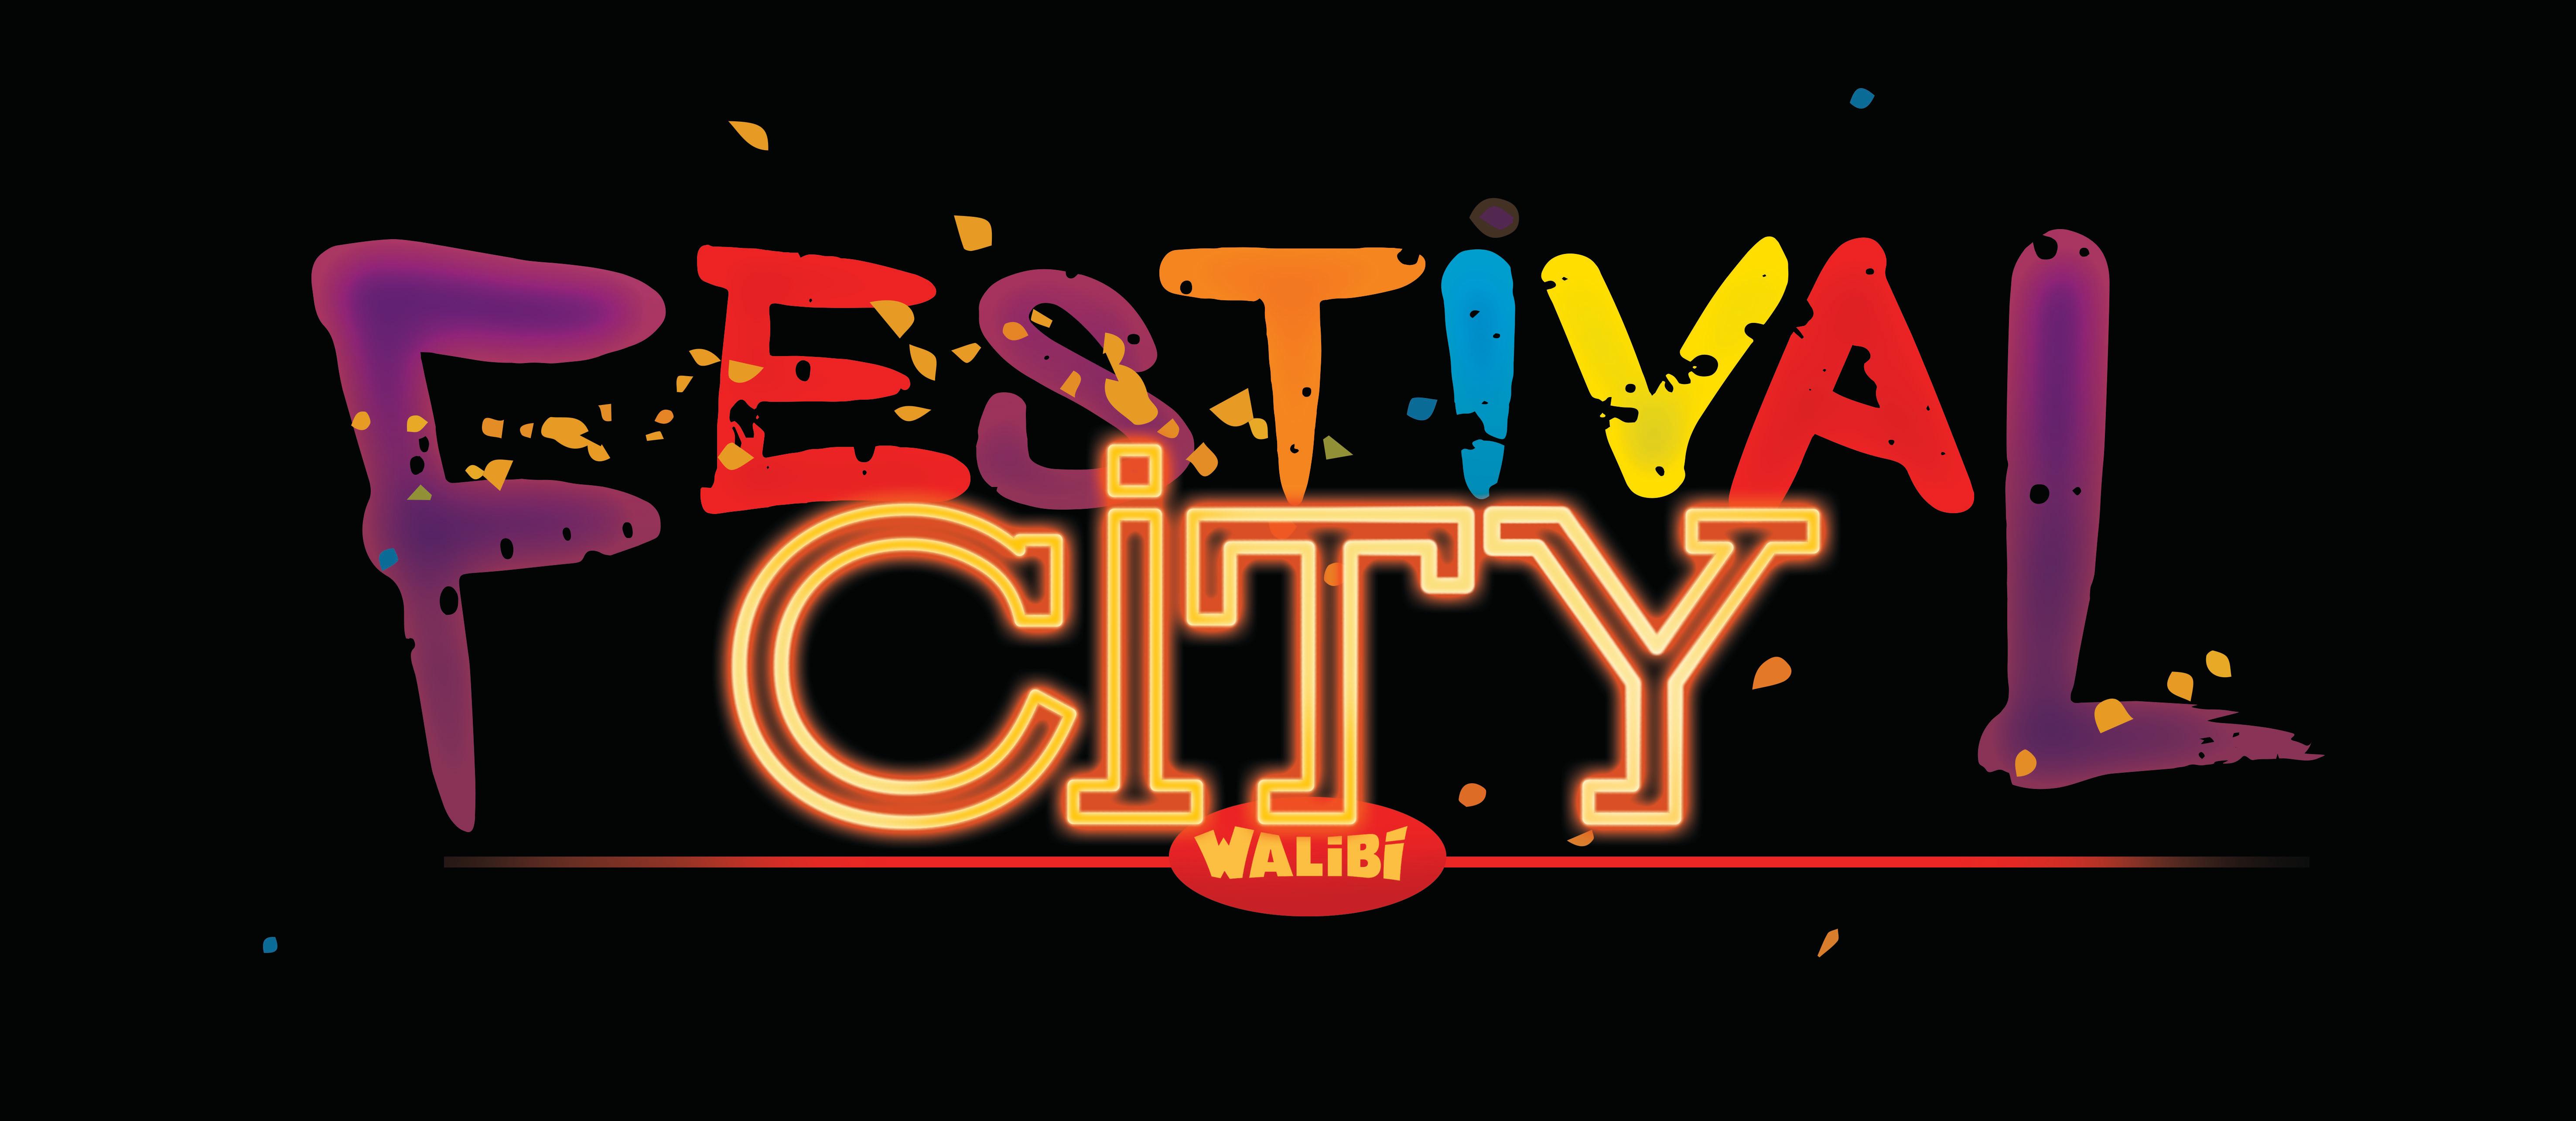 logo_festival_city2